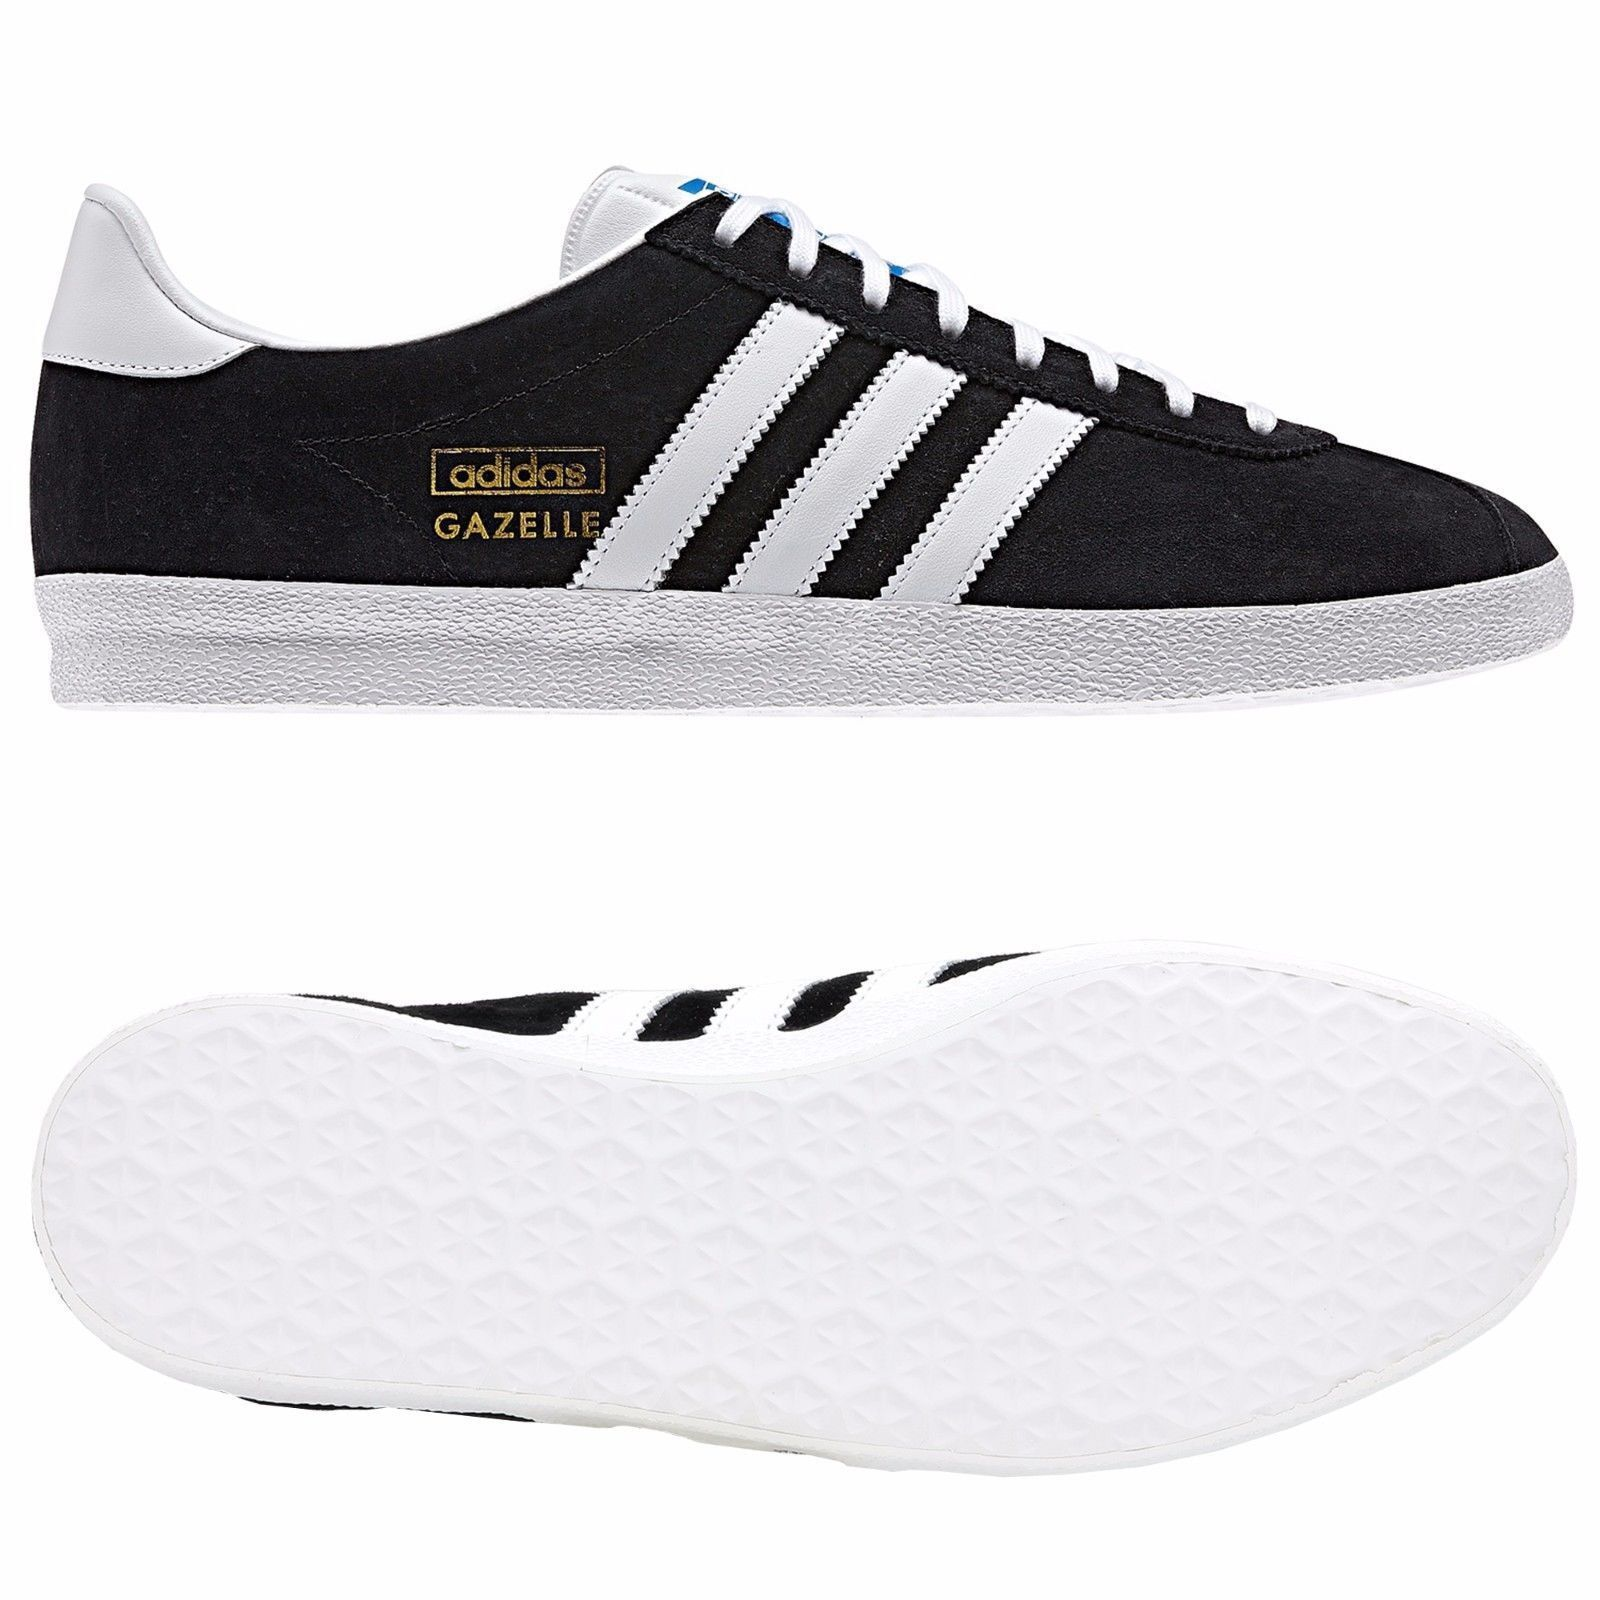 Adidas New Men's Gazelle OG Originals Suede Leather Trainers Shoes ...